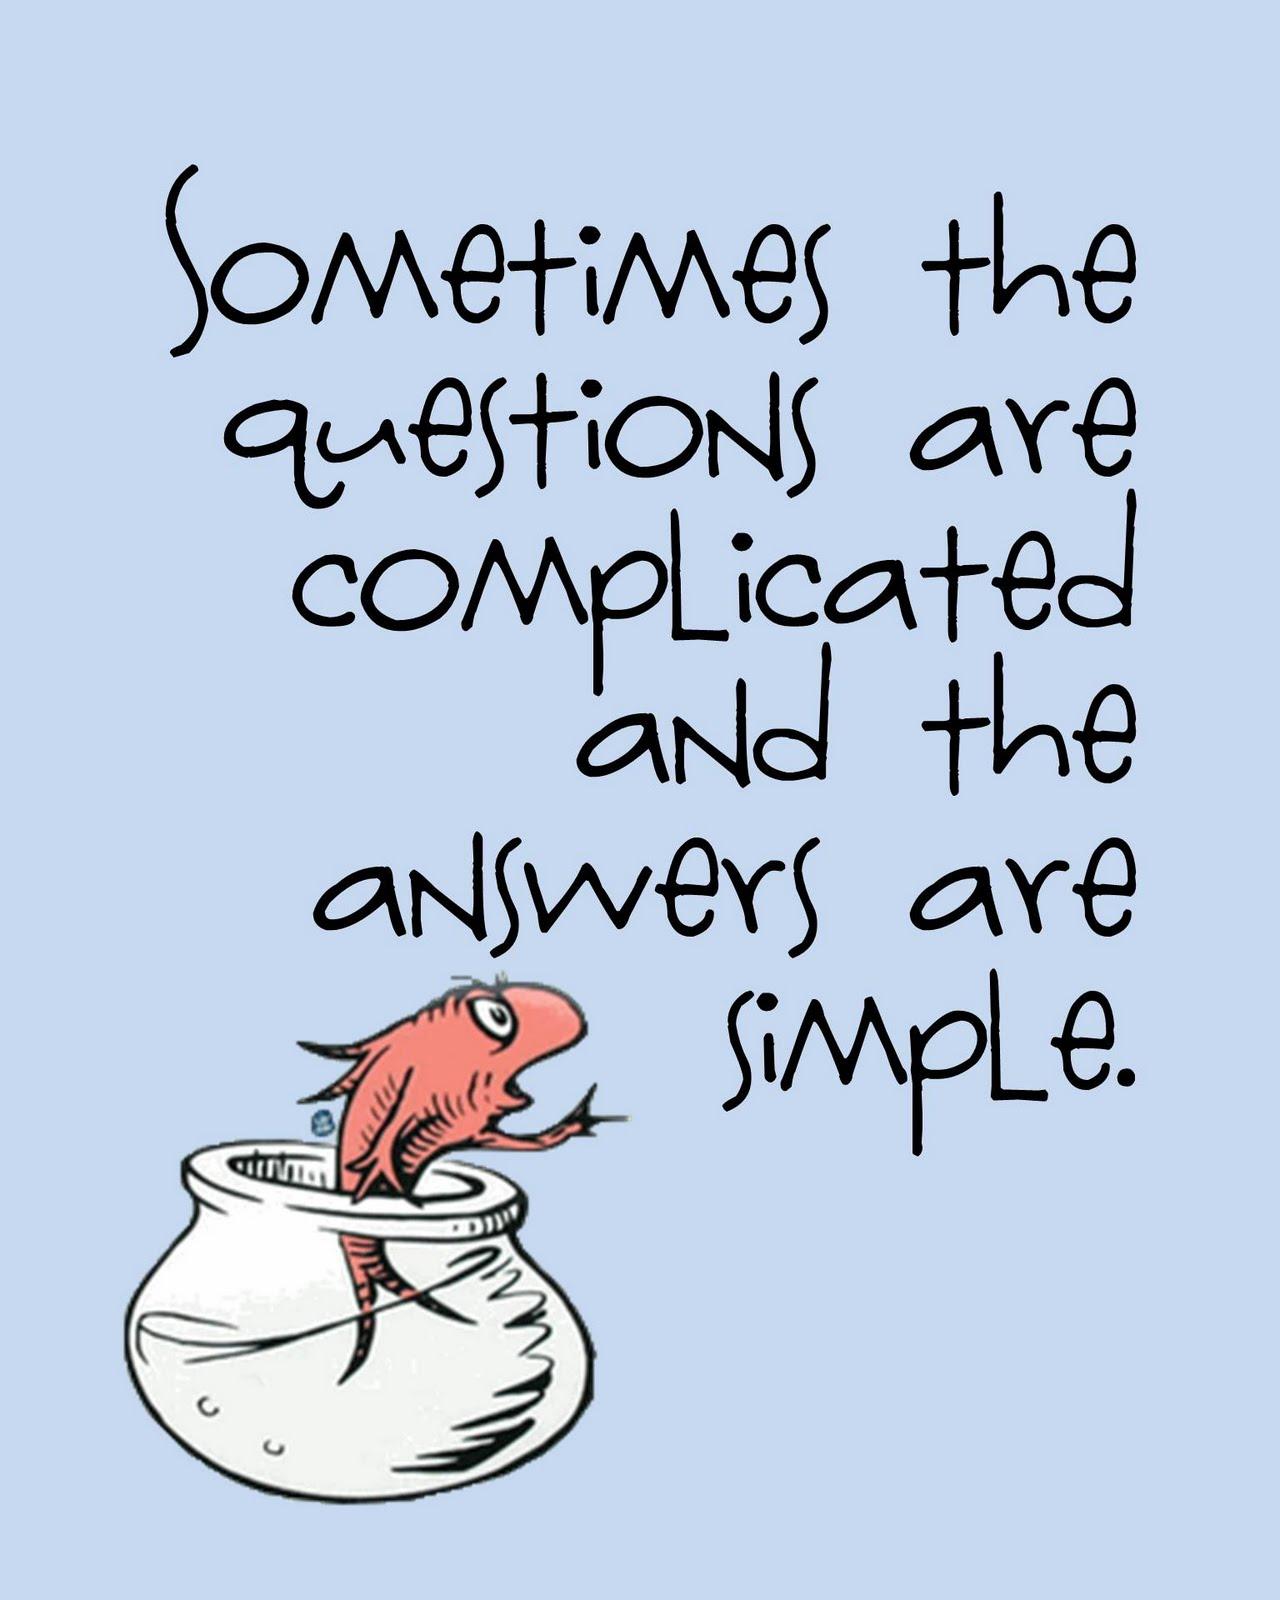 Dr Seuss Love Quotes dr seuss lorax quote [5]   Quotes links Dr Seuss Love Quotes